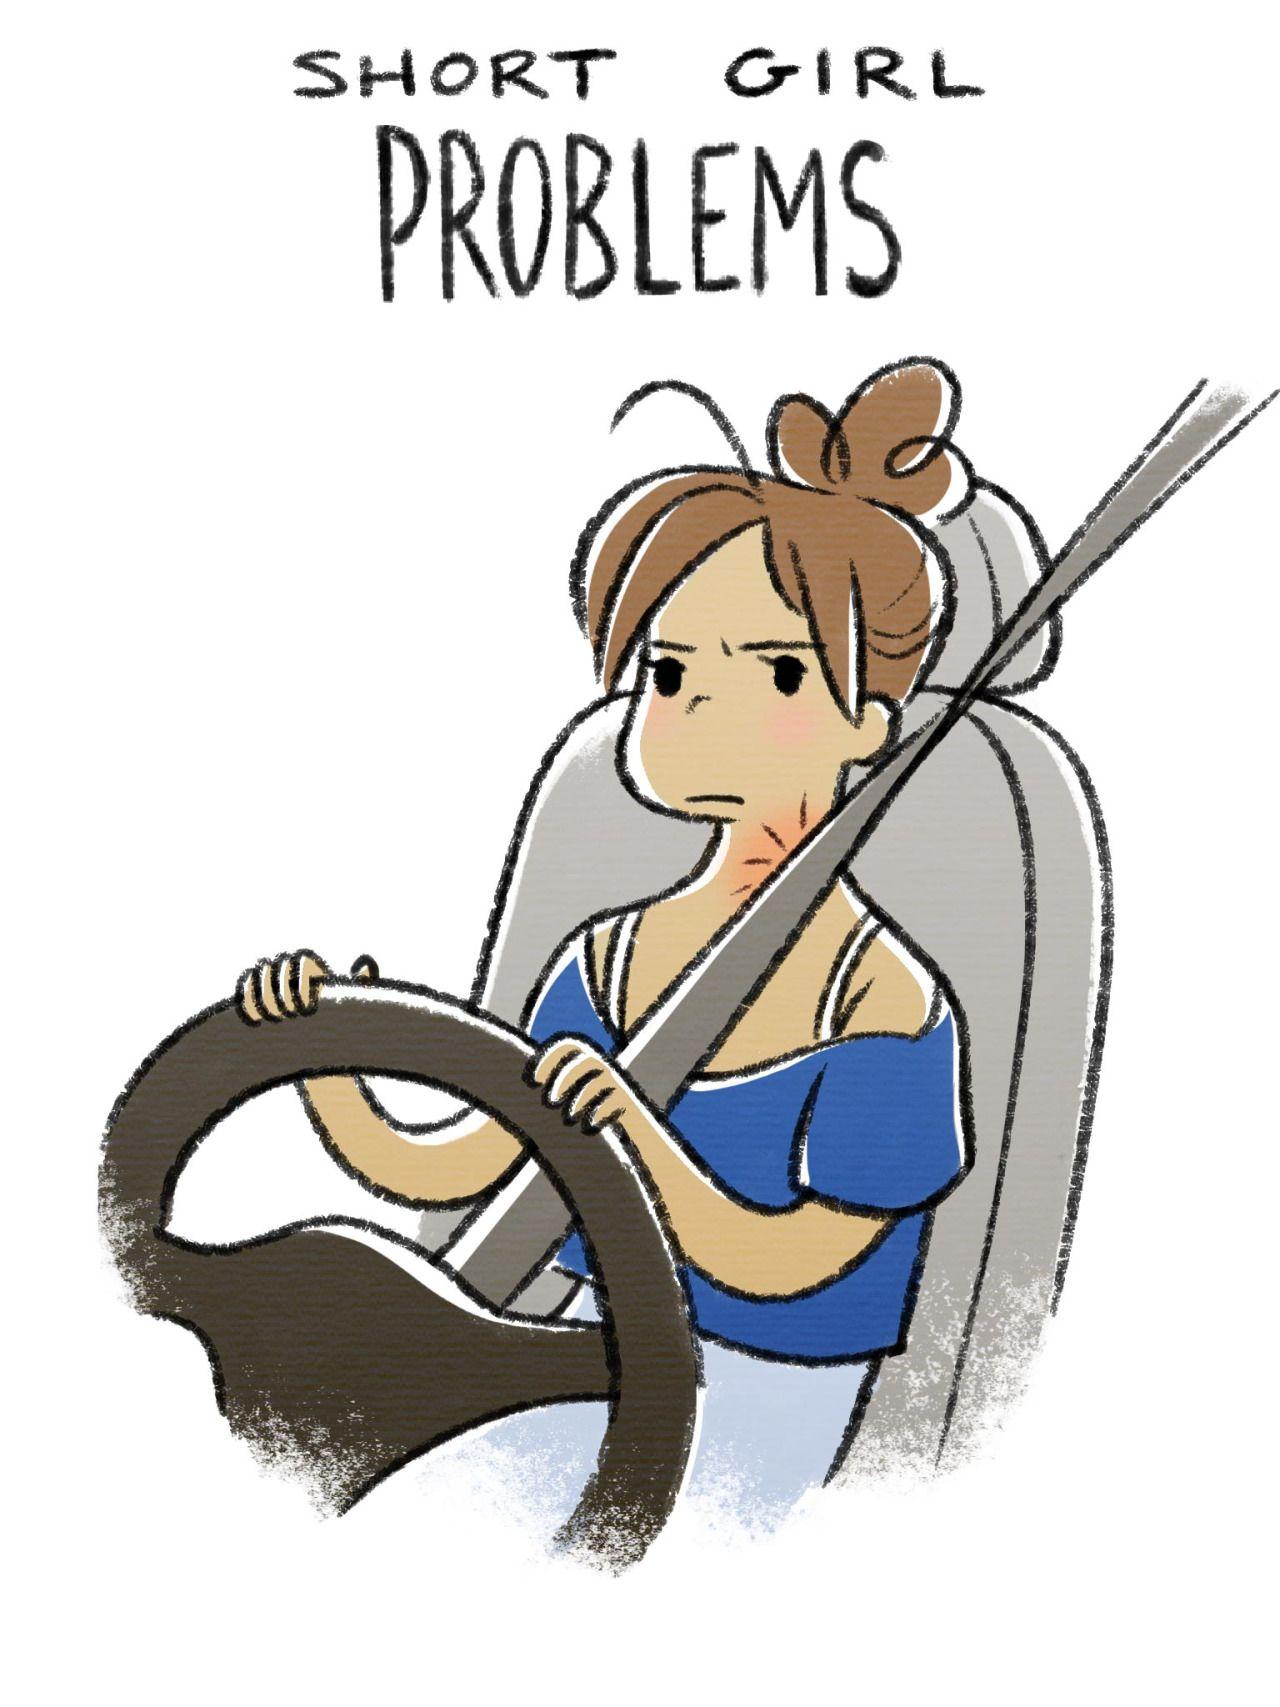 short girl problems - Google Search | Short Girl Problems ...